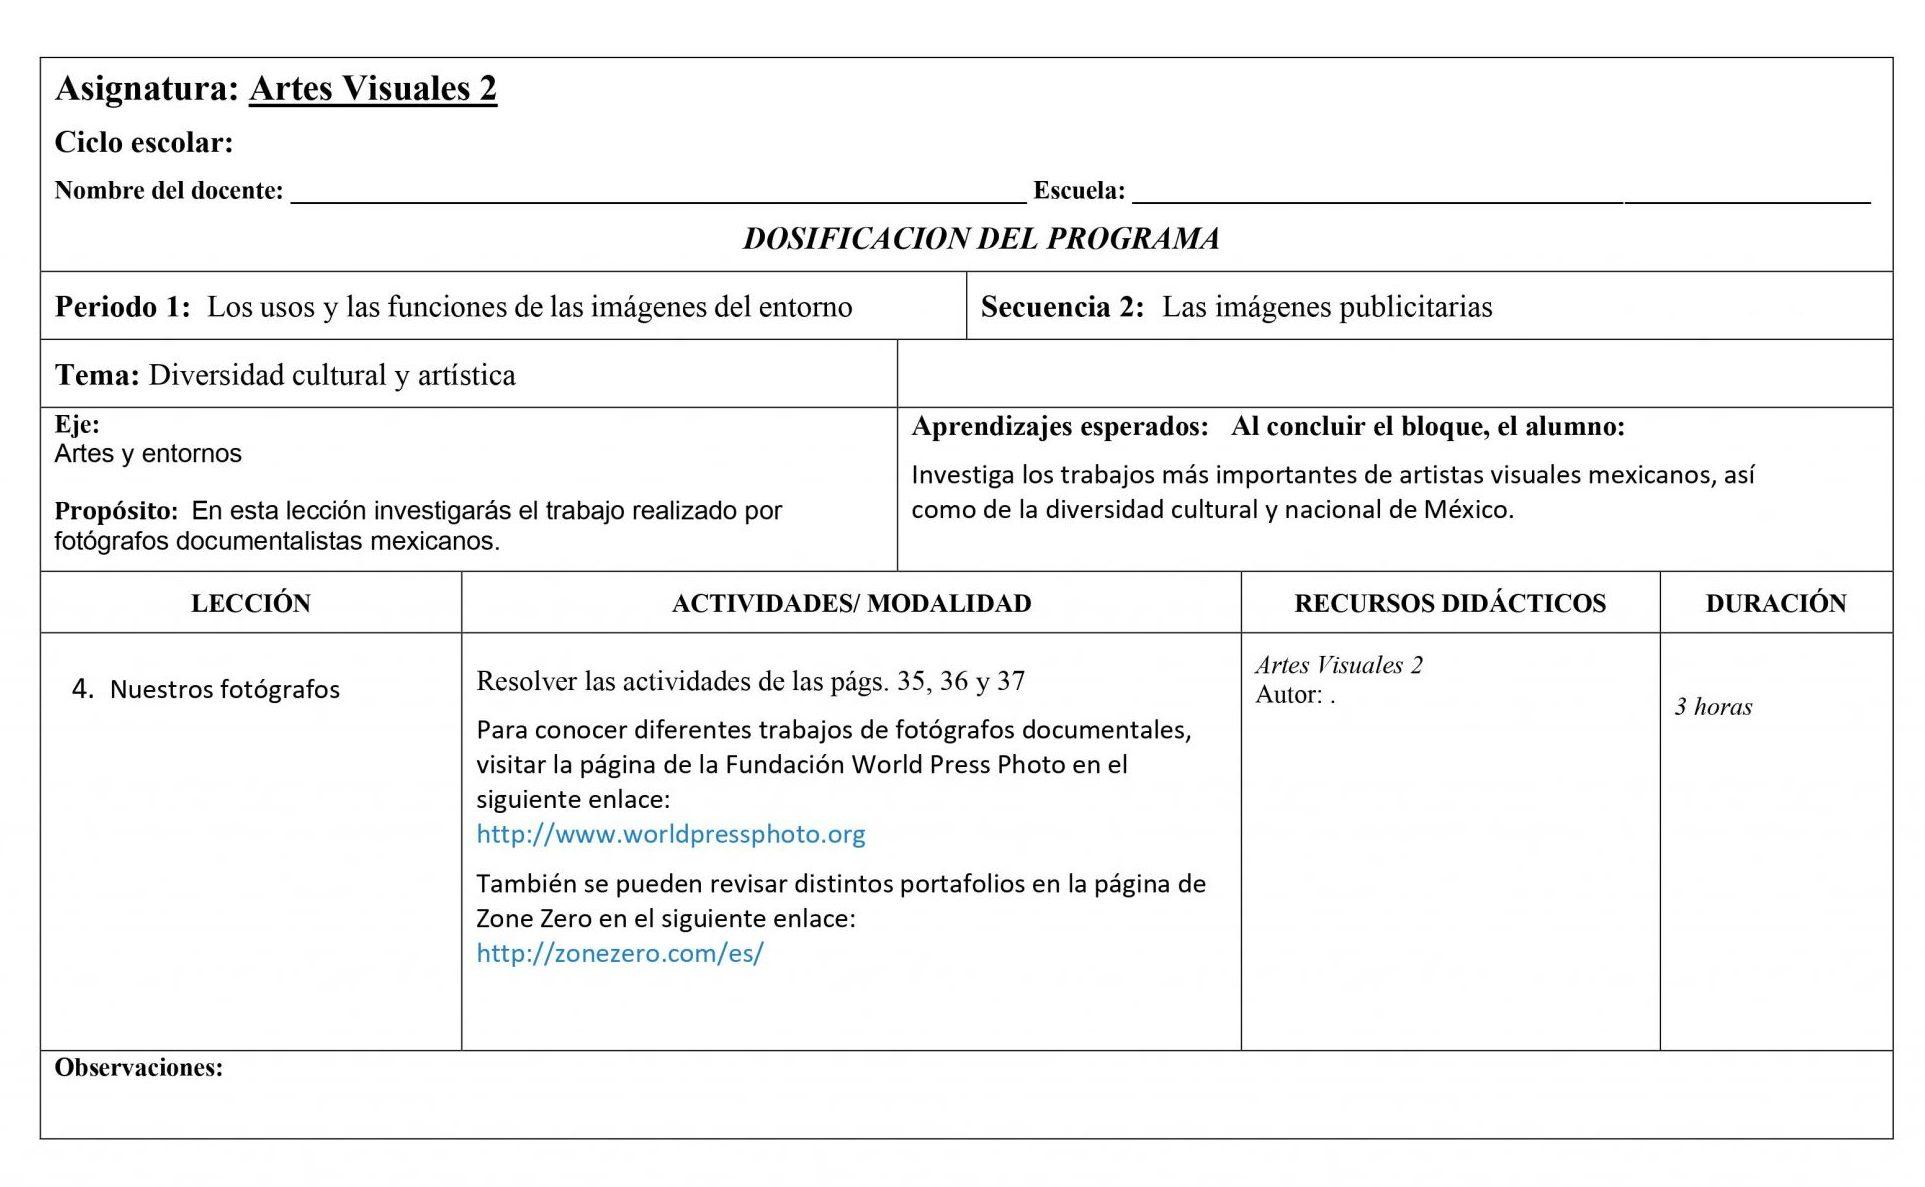 Dosificación Artes Visuales 2 Secundaria (Nuevo Modelo Educativo) 1er. Trimestre 04